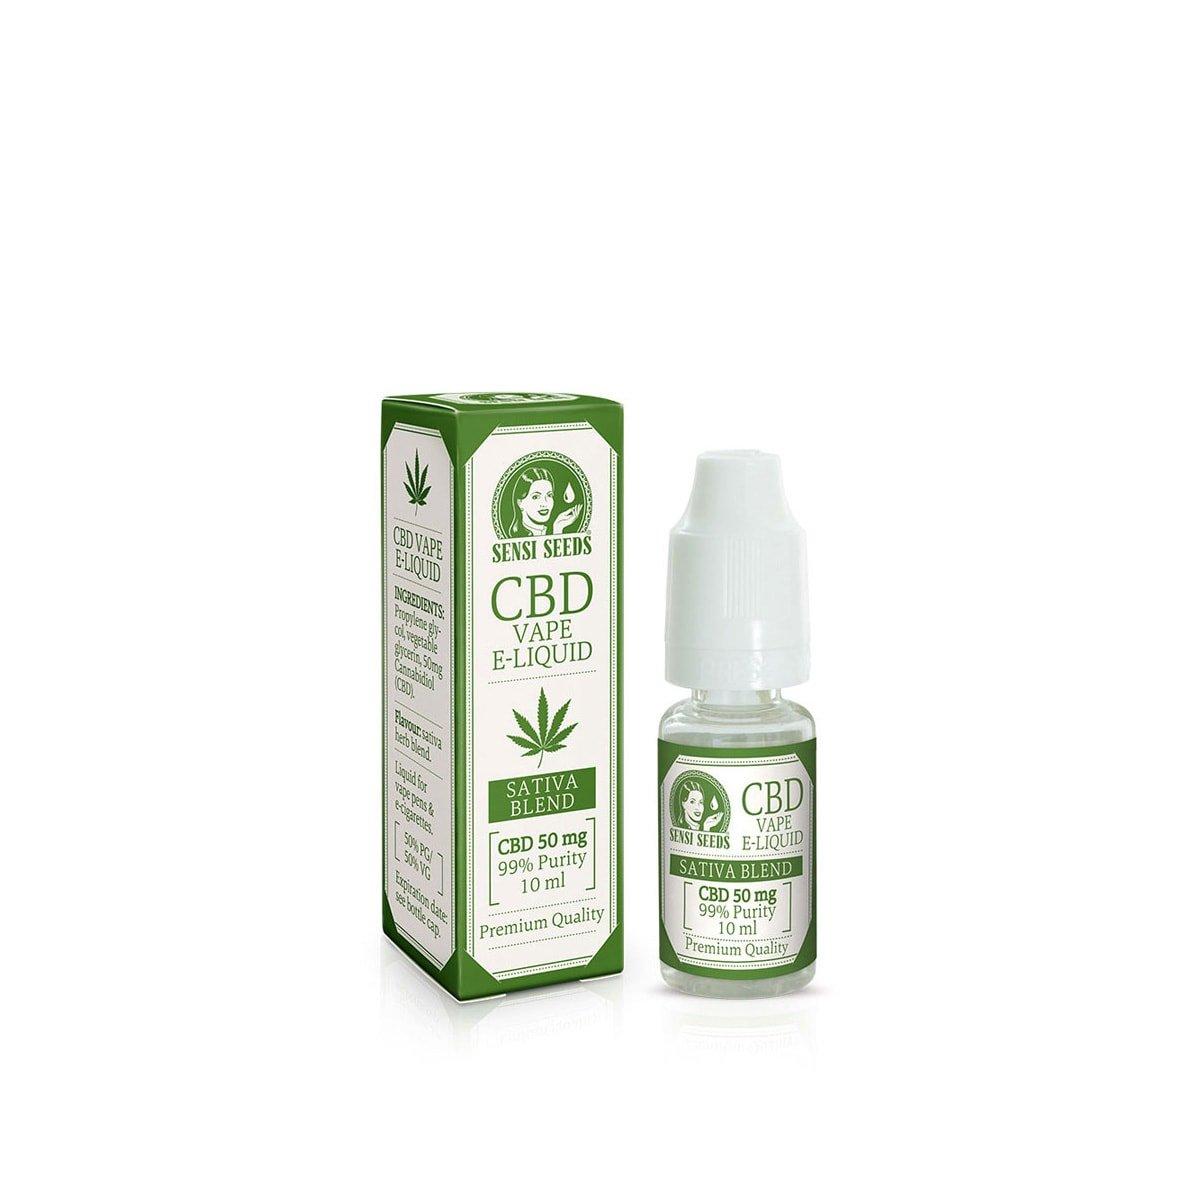 CBD E-Liquid (200mg) - SensiSeeds